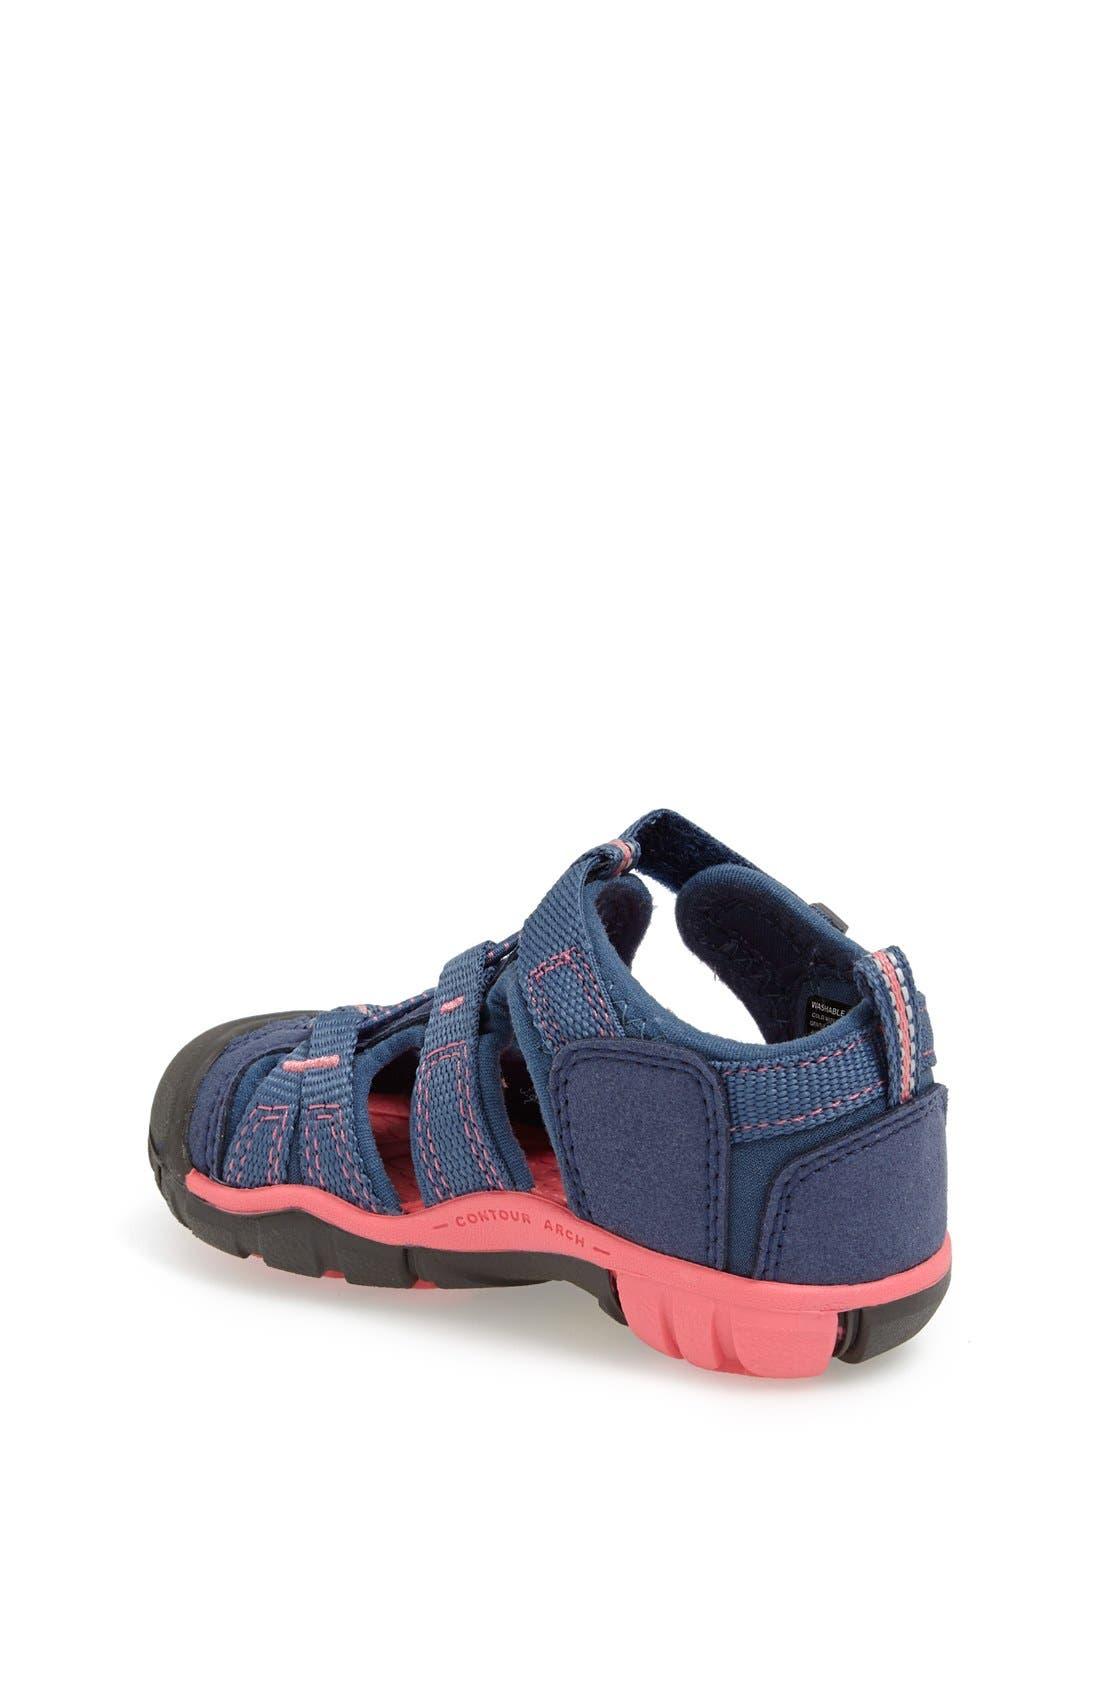 'Seacamp II' Waterproof Sandal,                             Alternate thumbnail 3, color,                             415